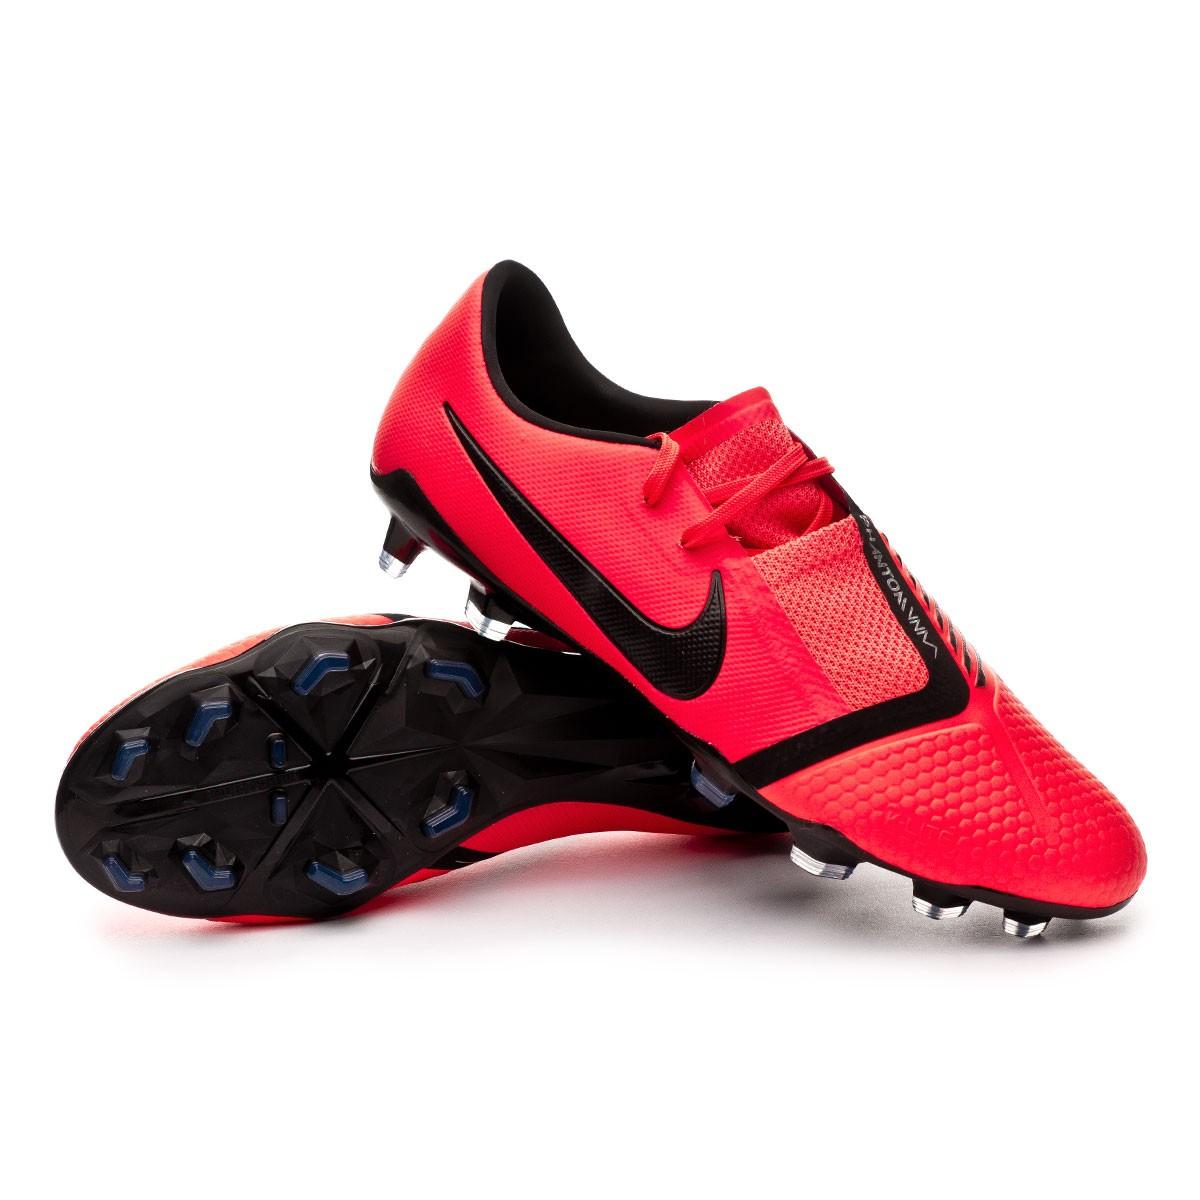 Montañas climáticas siesta Salida  Football Boots Nike Phantom Venom Academy AG R Bright .